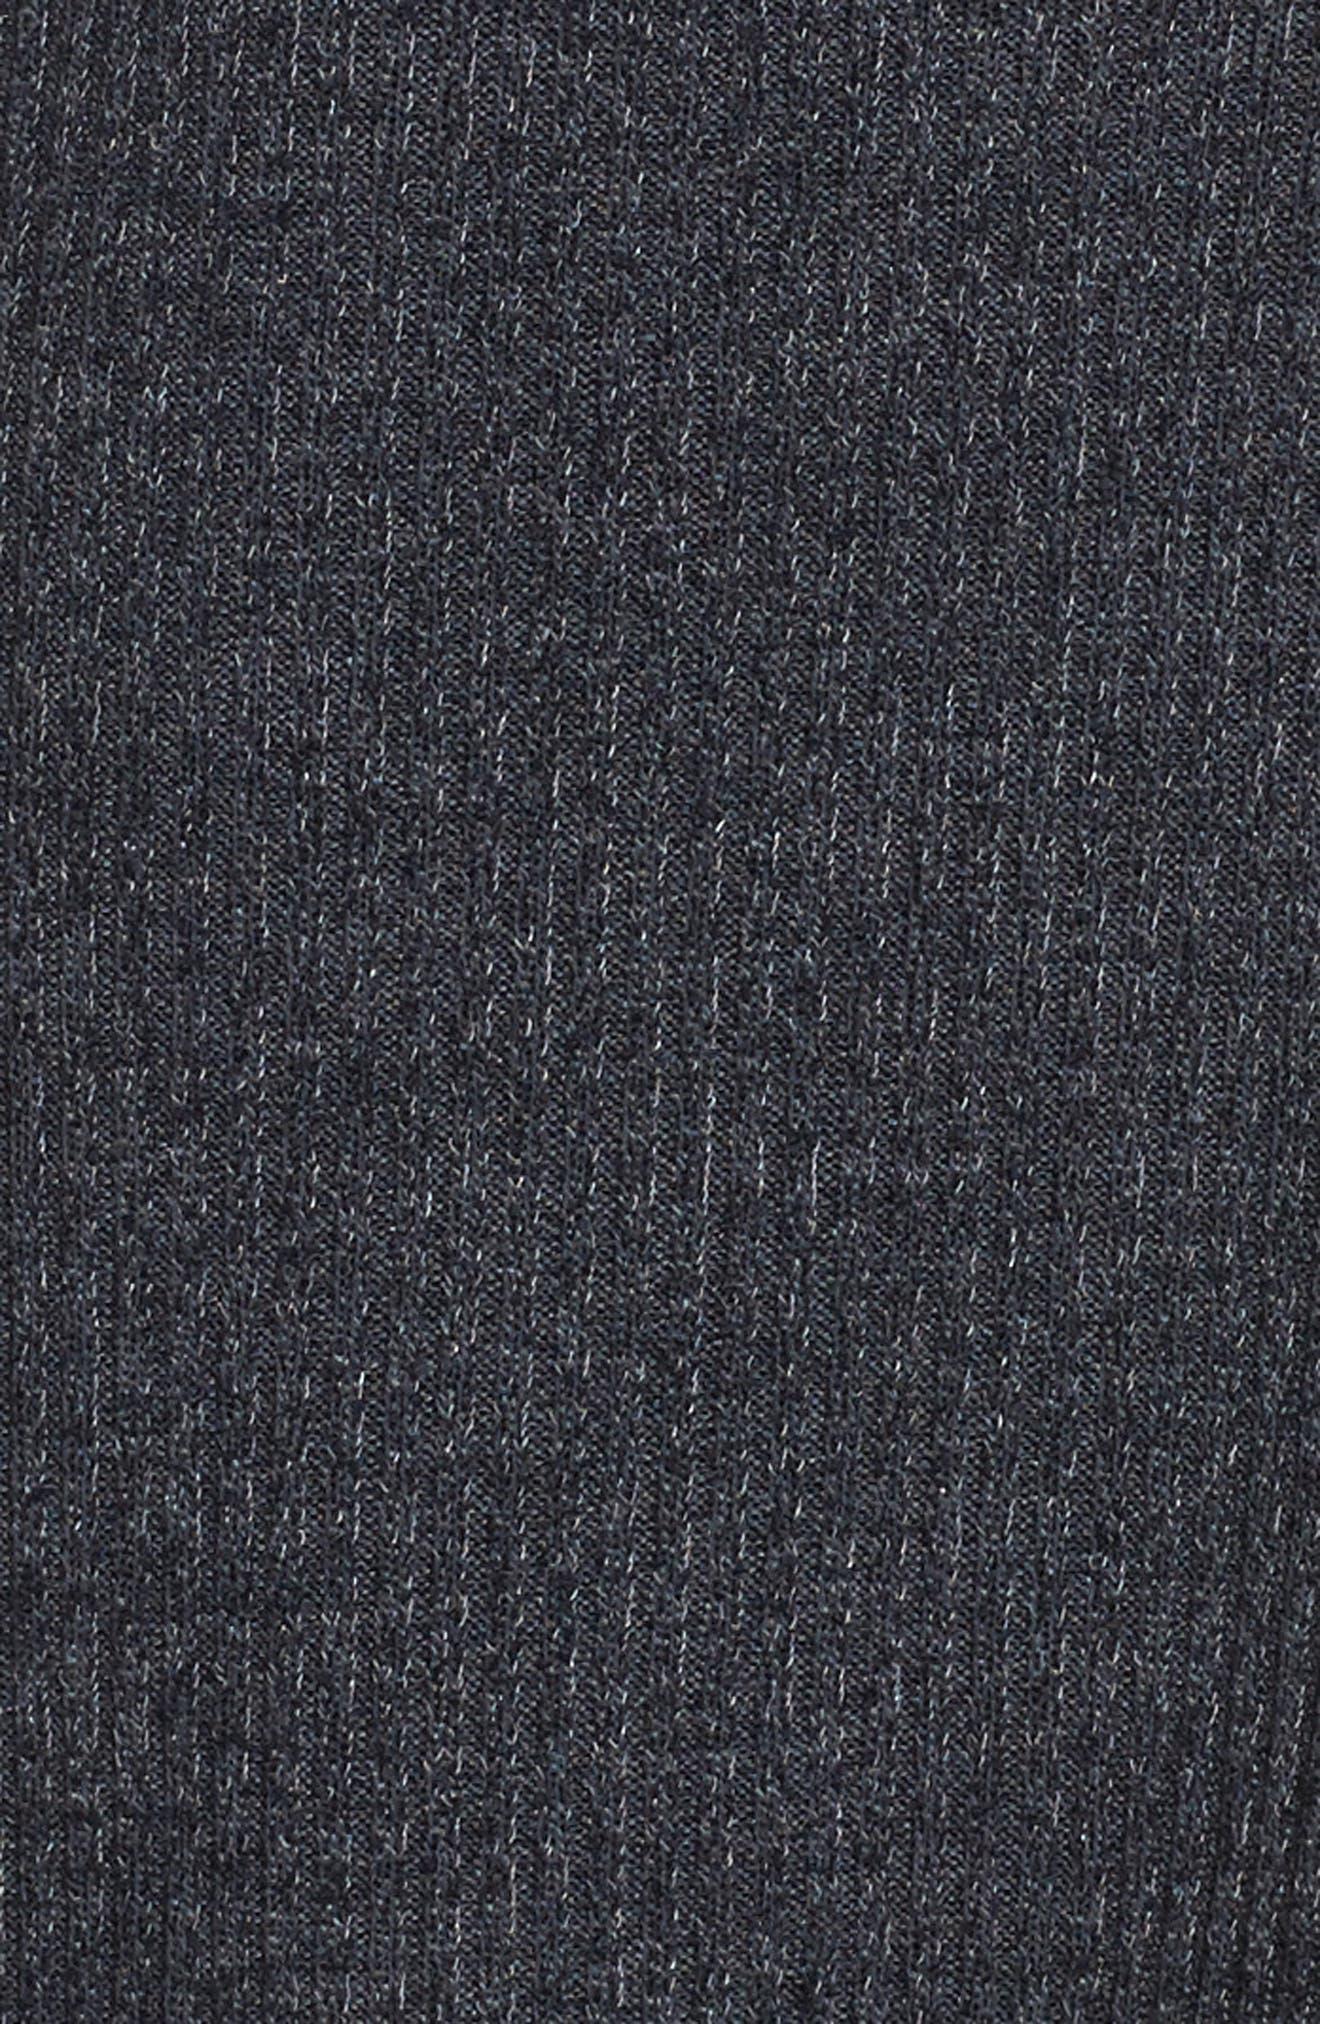 Corset Detail Sweatshirt Dress,                             Alternate thumbnail 5, color,                             020